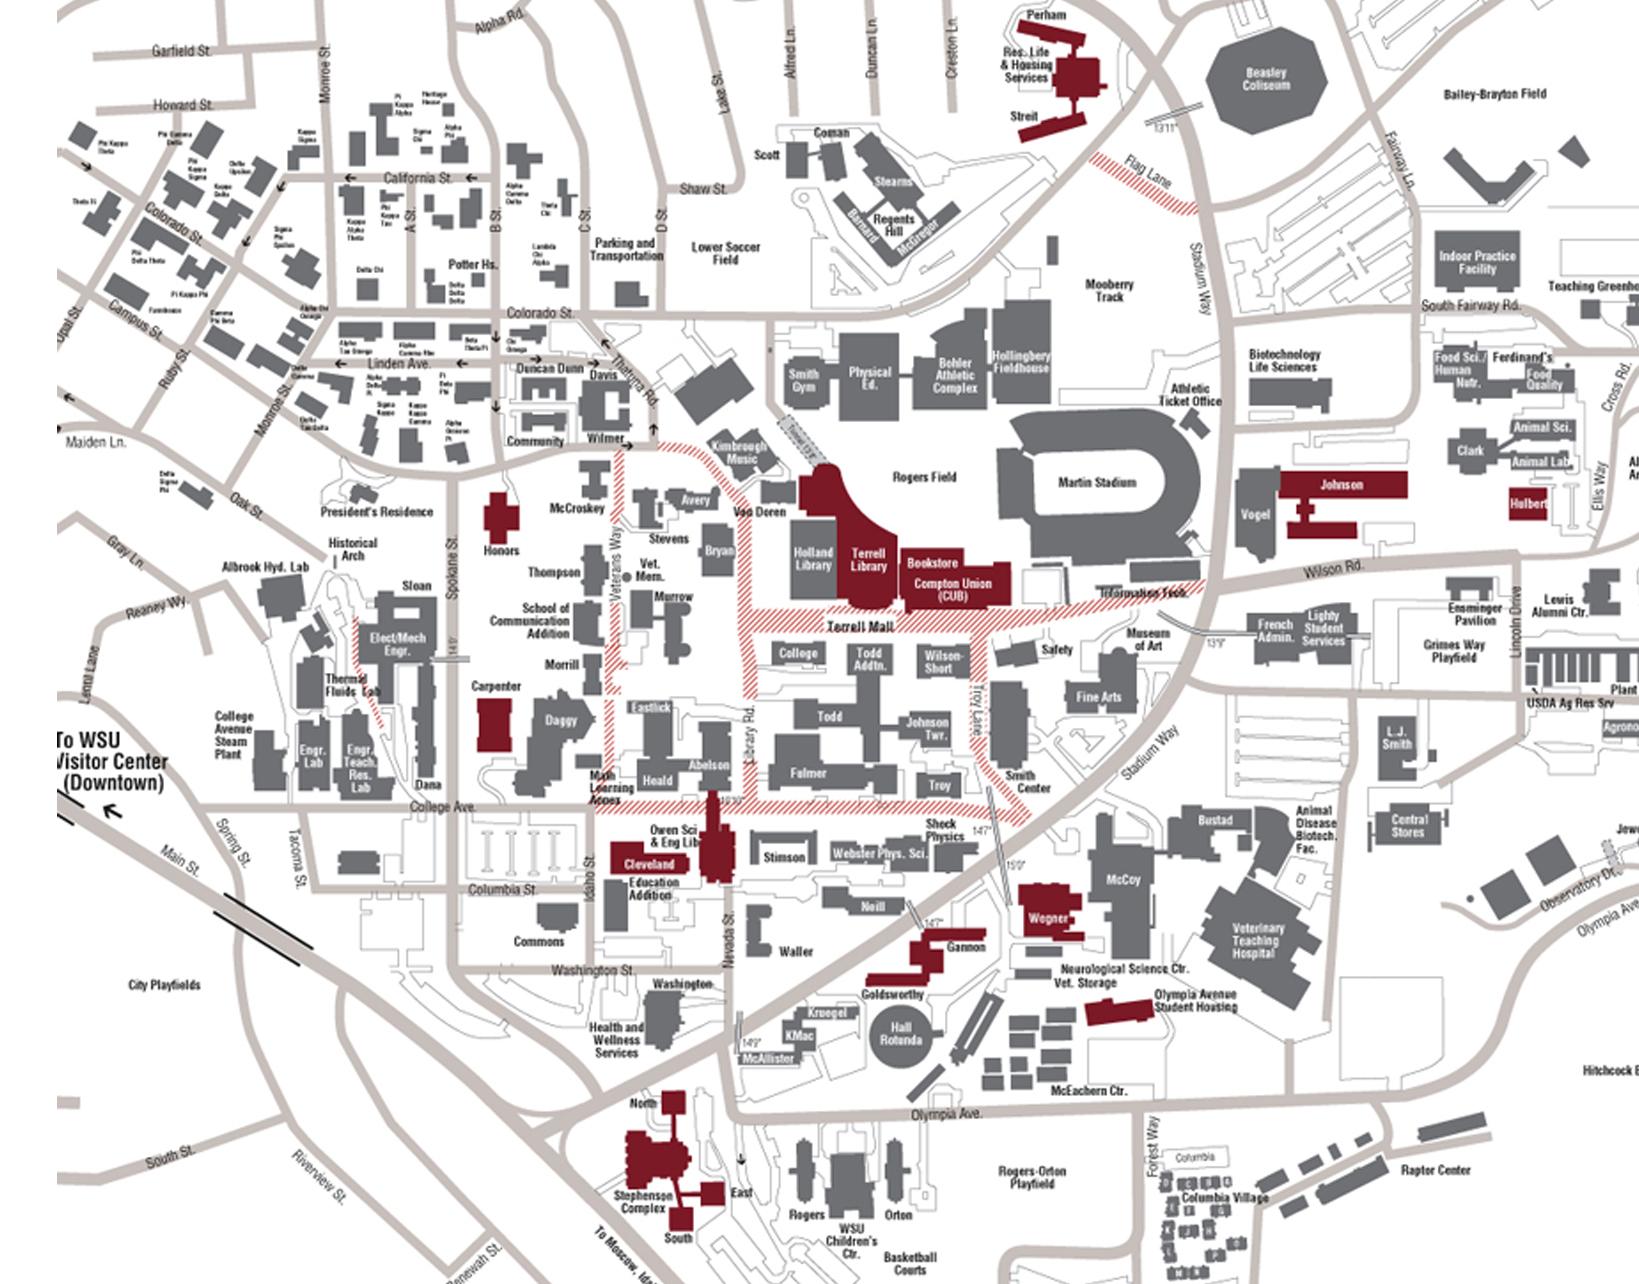 Wsu Pullman Campus Map | Park Map